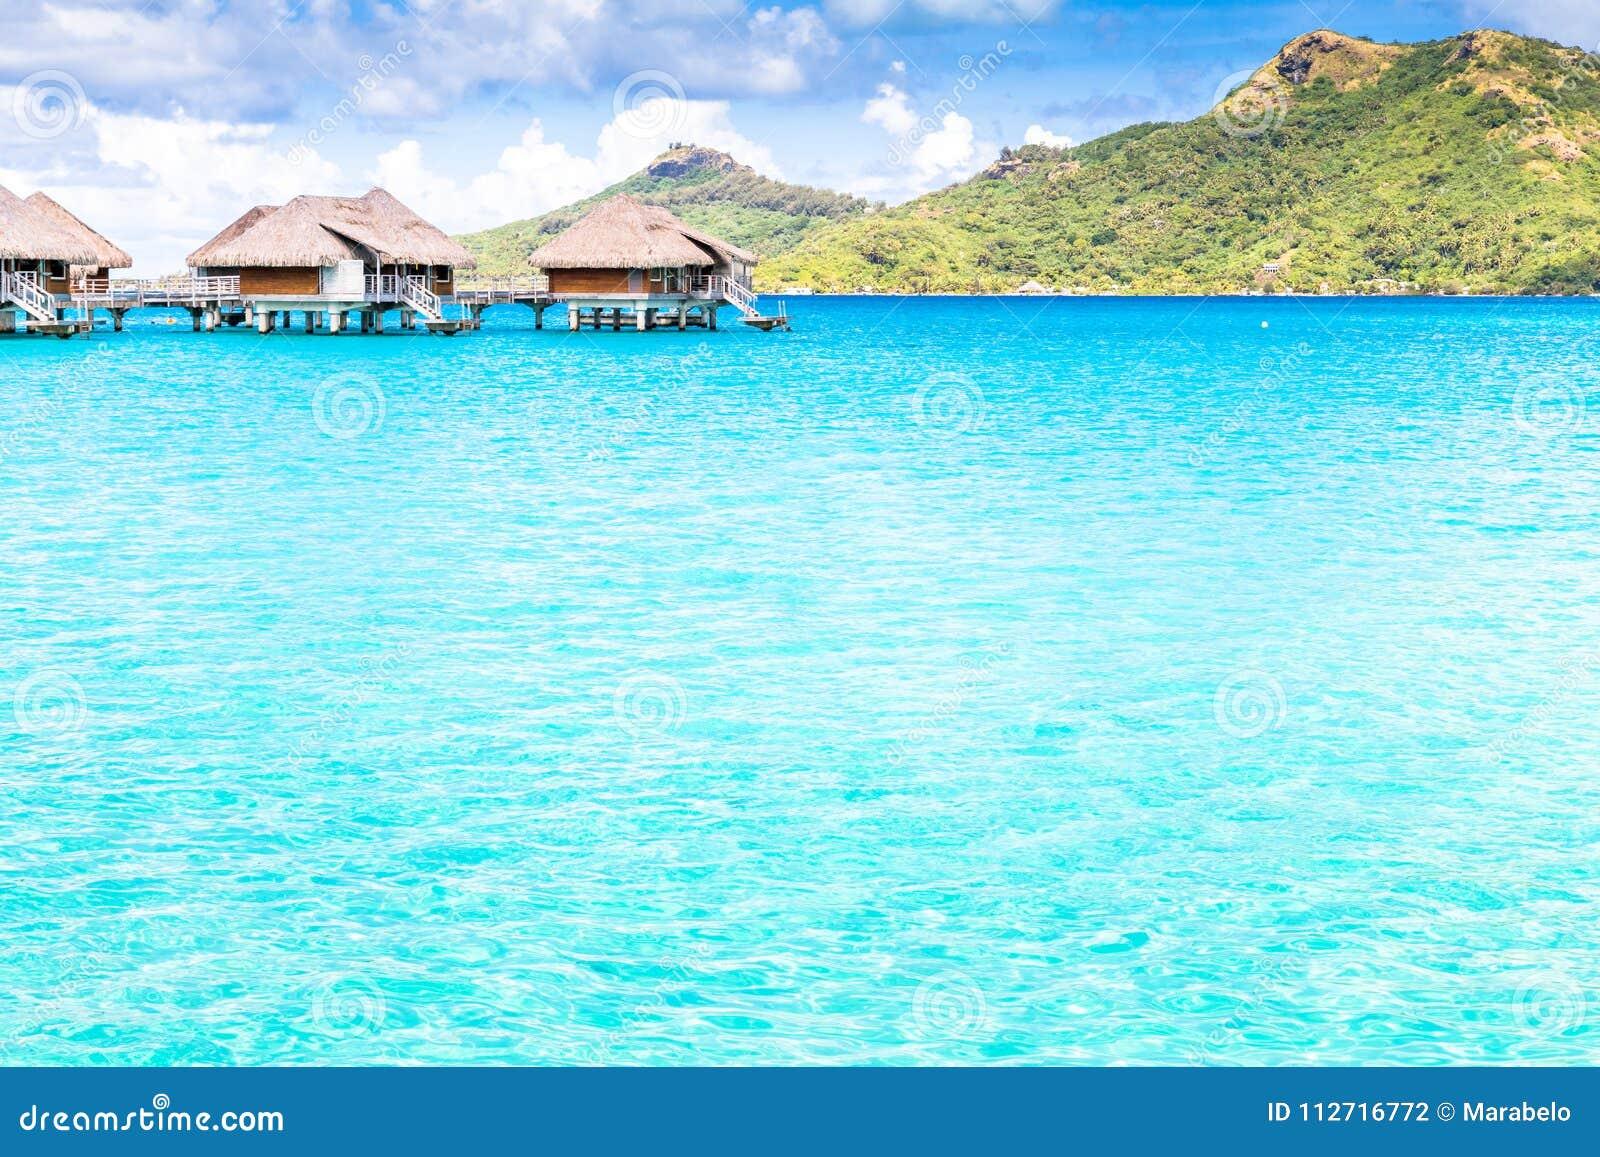 Bora Bora Island French Polynesia A True Paradise With